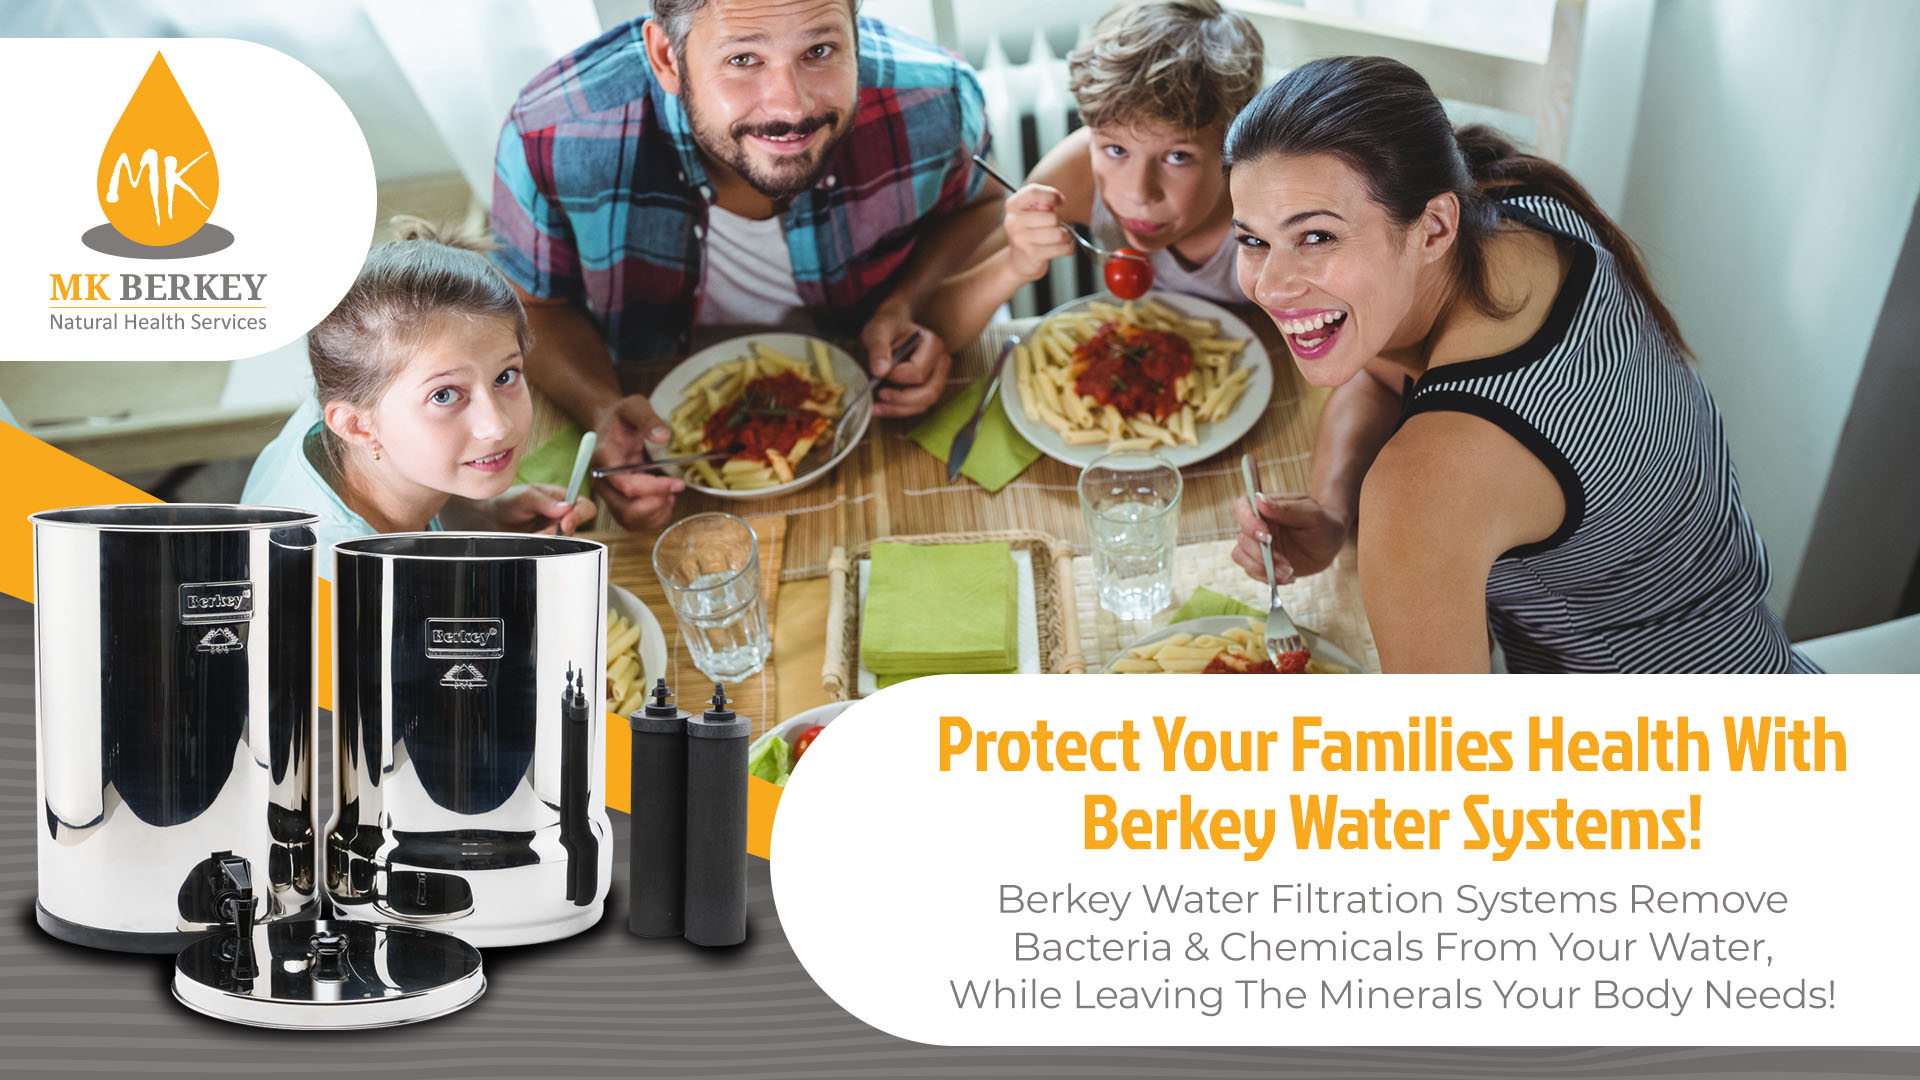 228437_Berkey Water Slider 2_V3_091718.jpg